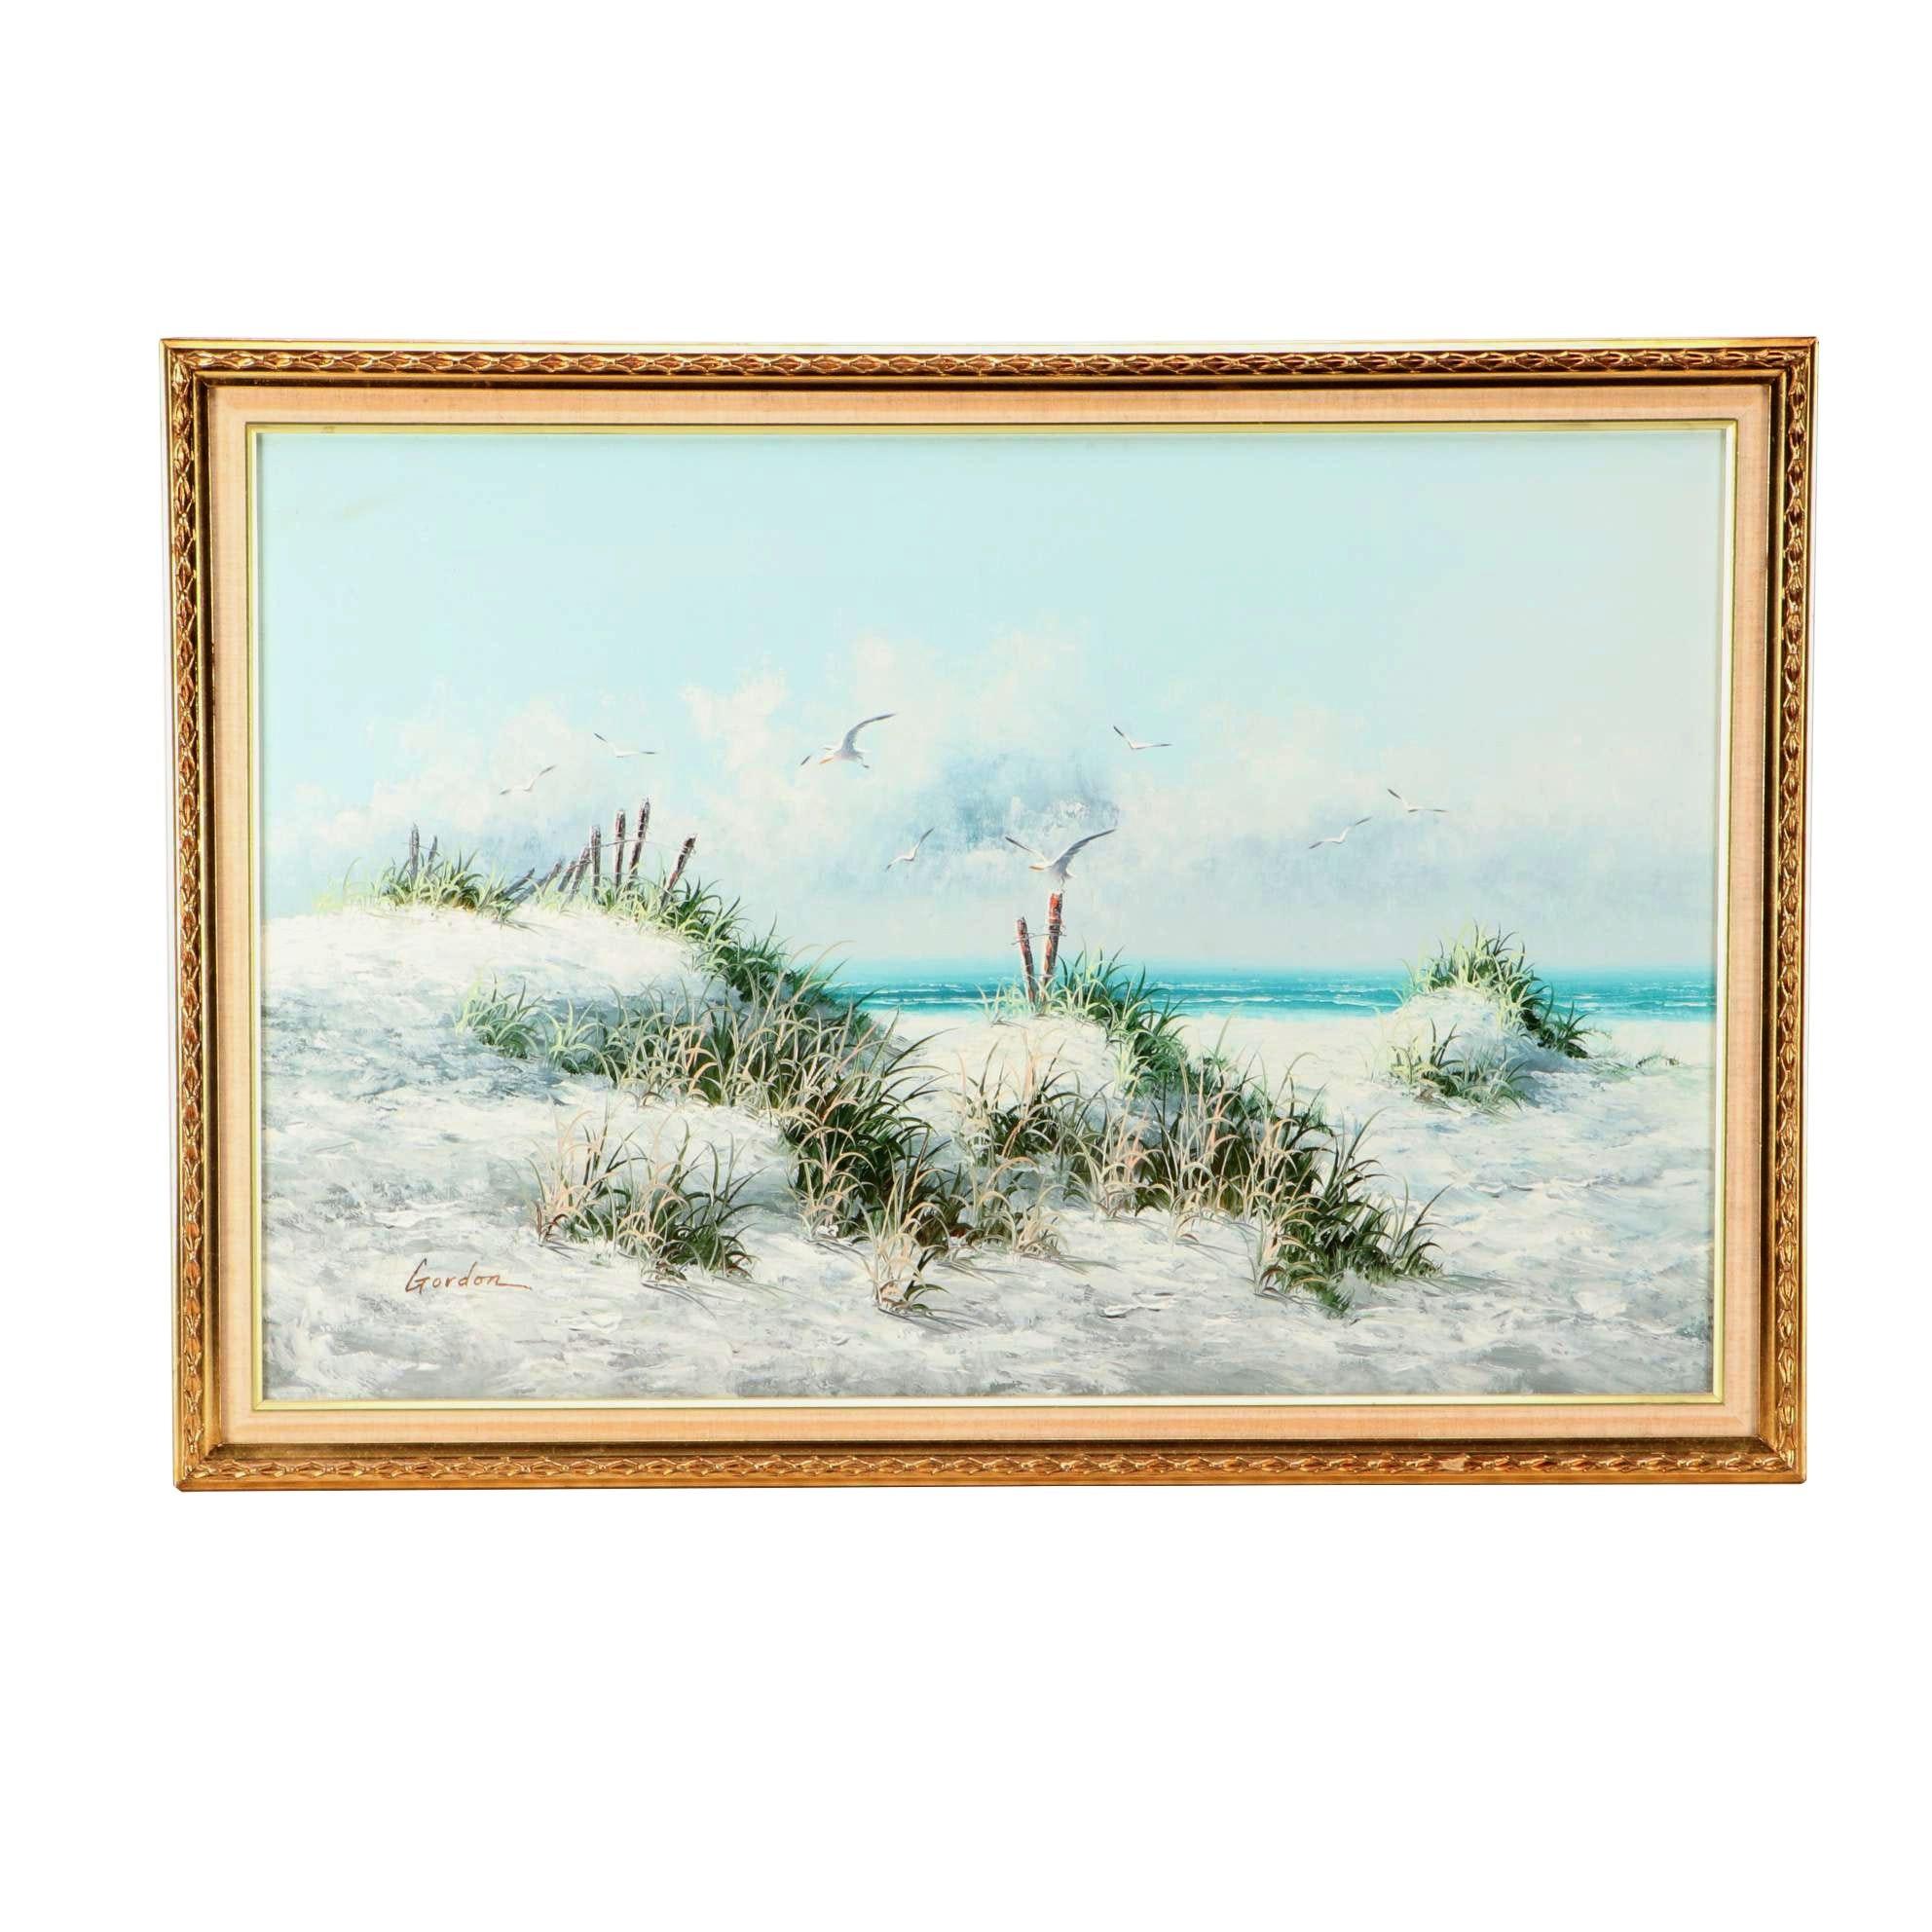 Gordon Oil Painting of Coastal Scene